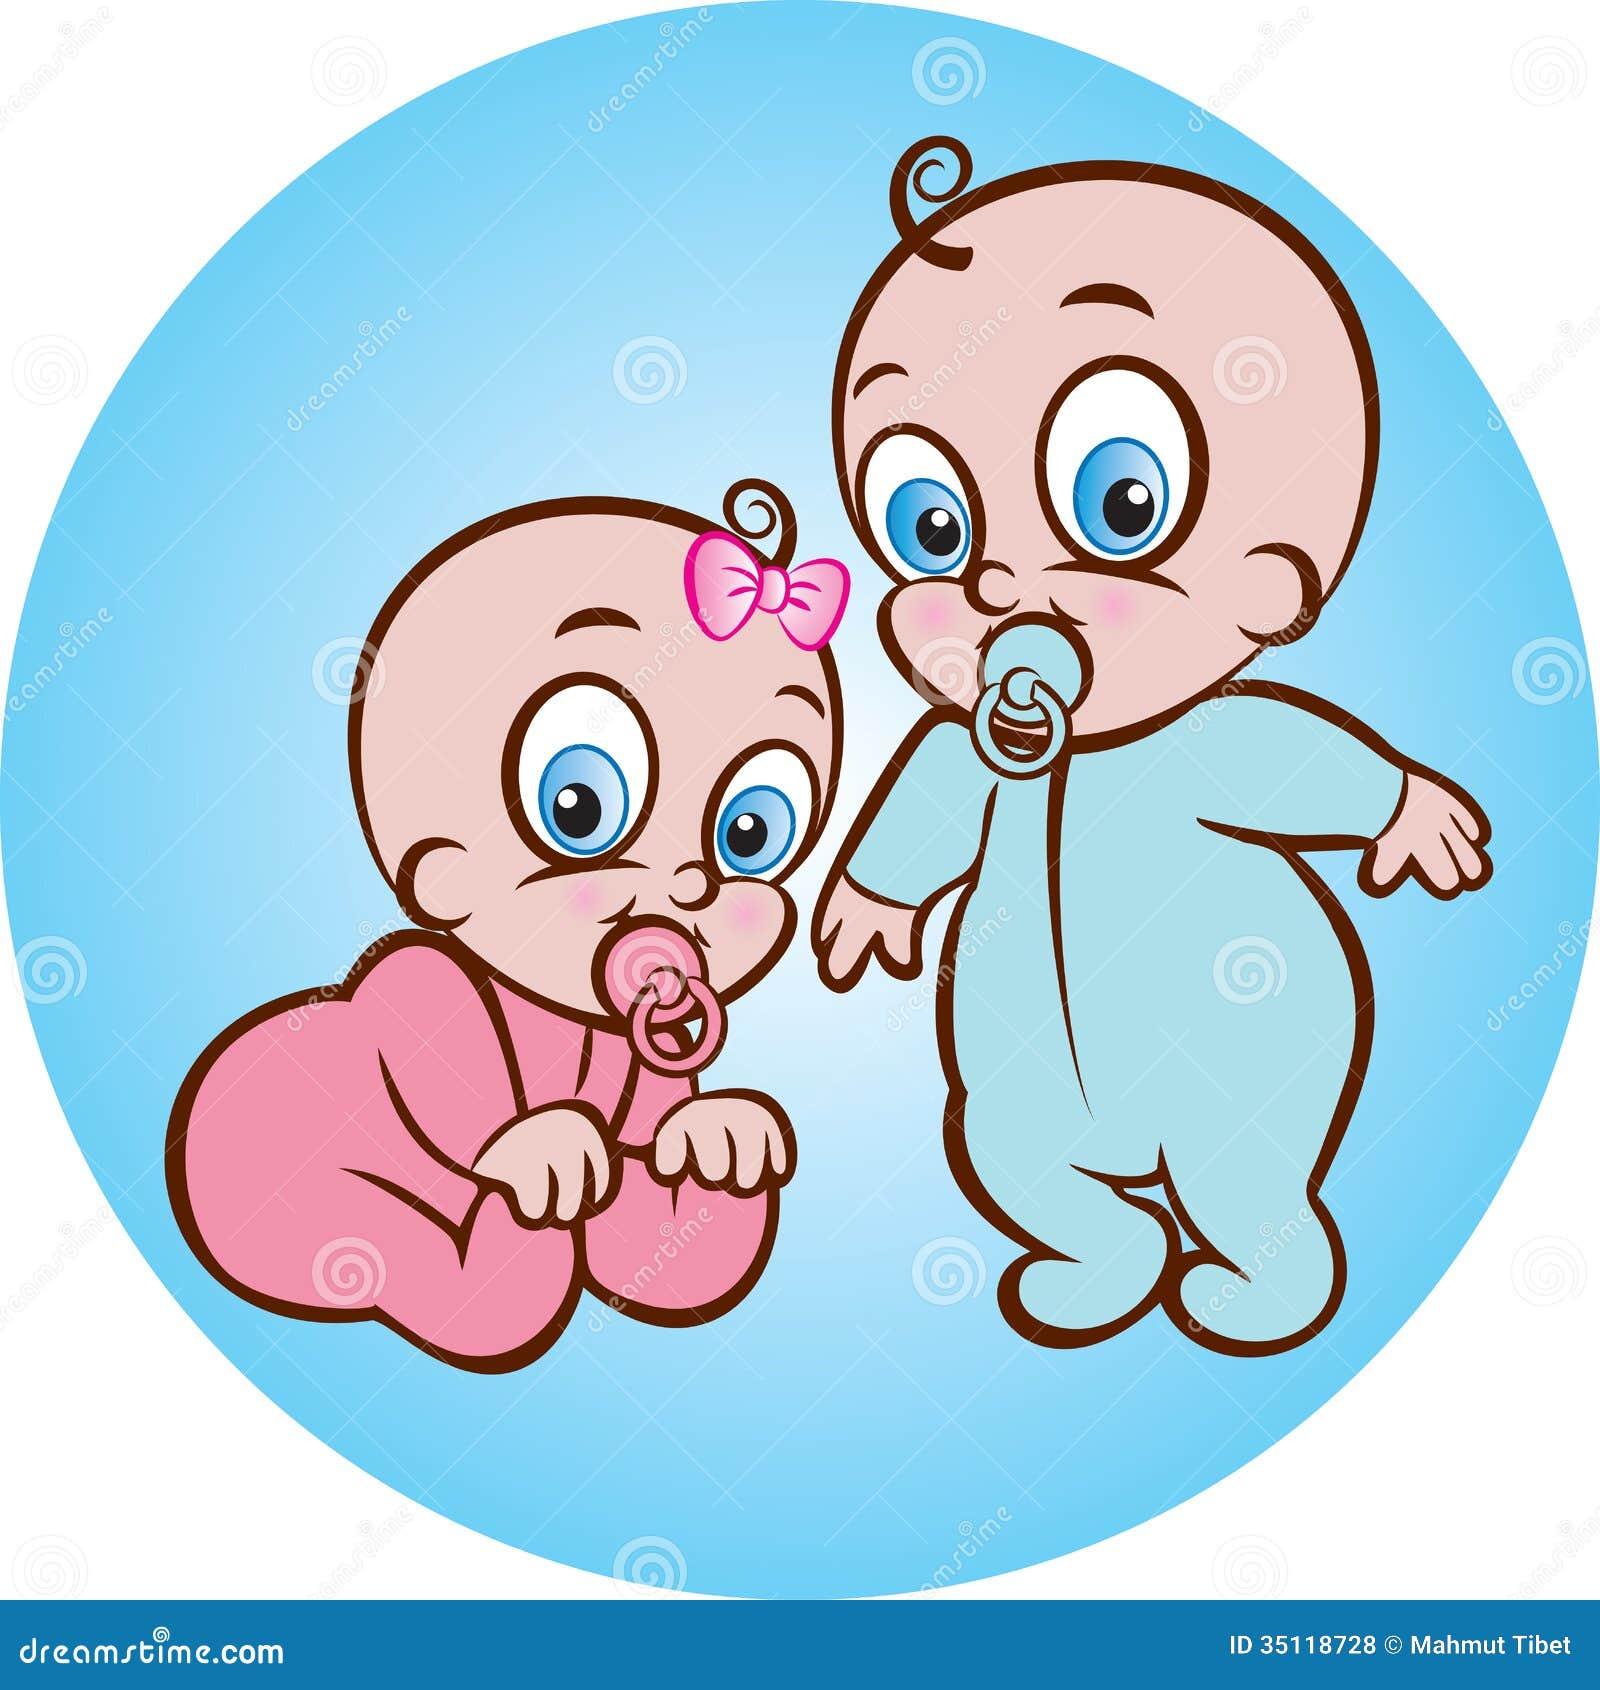 happy baby boy and girl royalty free stock photos image arizona clip art outline arizona clip art outline